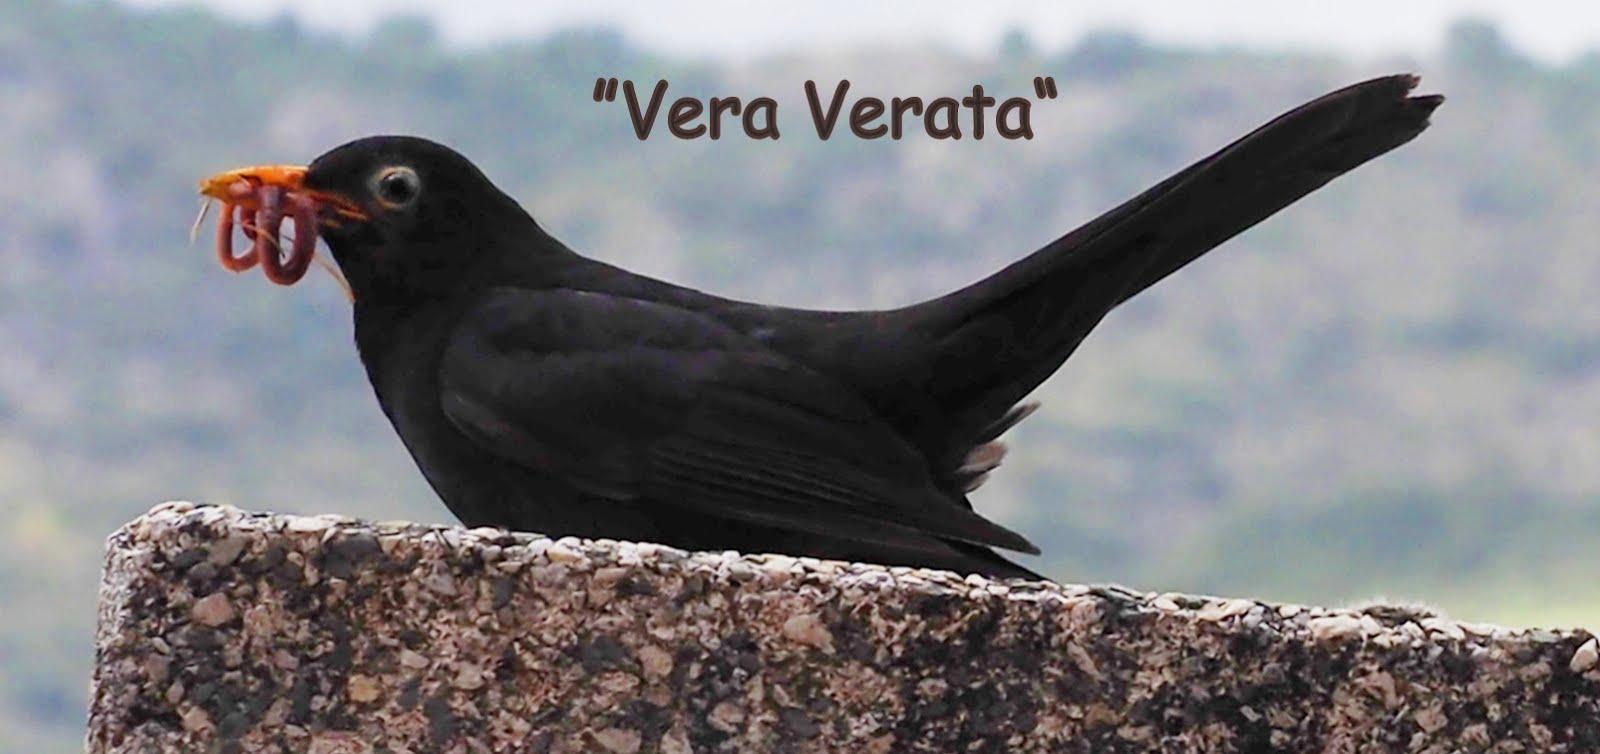 Veraverata. La Vera. Extremadura